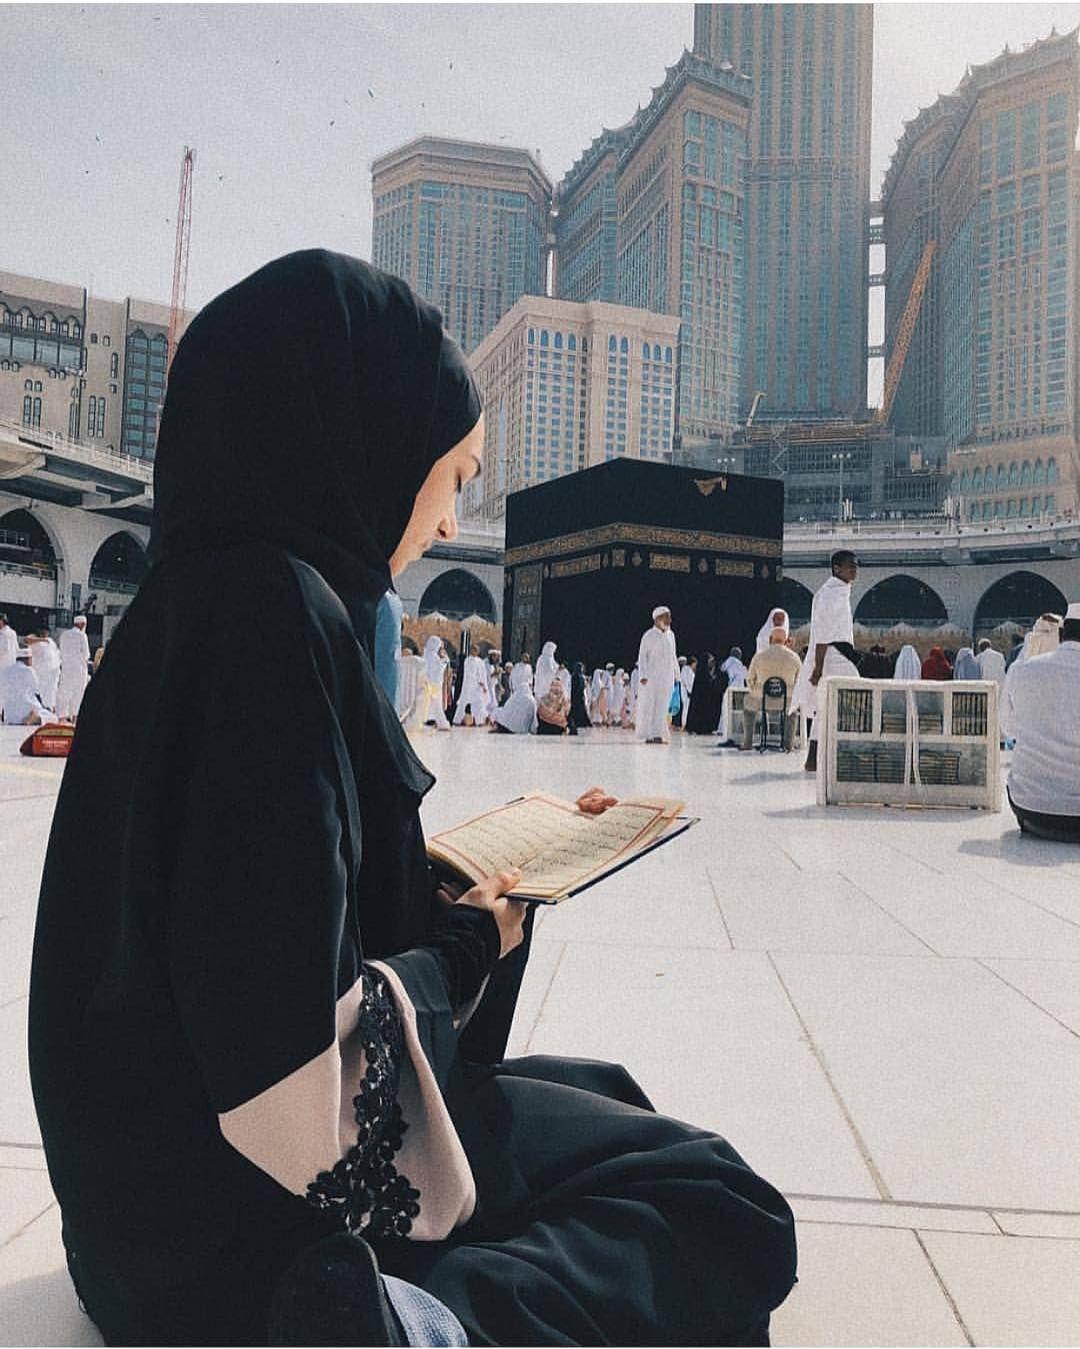 "Photo of 🧕🏼 hijab style icon 🧕🏼 on Instagram: ""🕋🕋🕋🕋🕋🕋🕋🕋🕋🕋🕋🕋🕋🕋 ❤️ ~~~~~~~~~~~~~ FOLLOW @hijabstyleicon # tesettur # hijabfashion #hijab #hijabi #love #hijabers #hijabstyle modest # modestwear … """